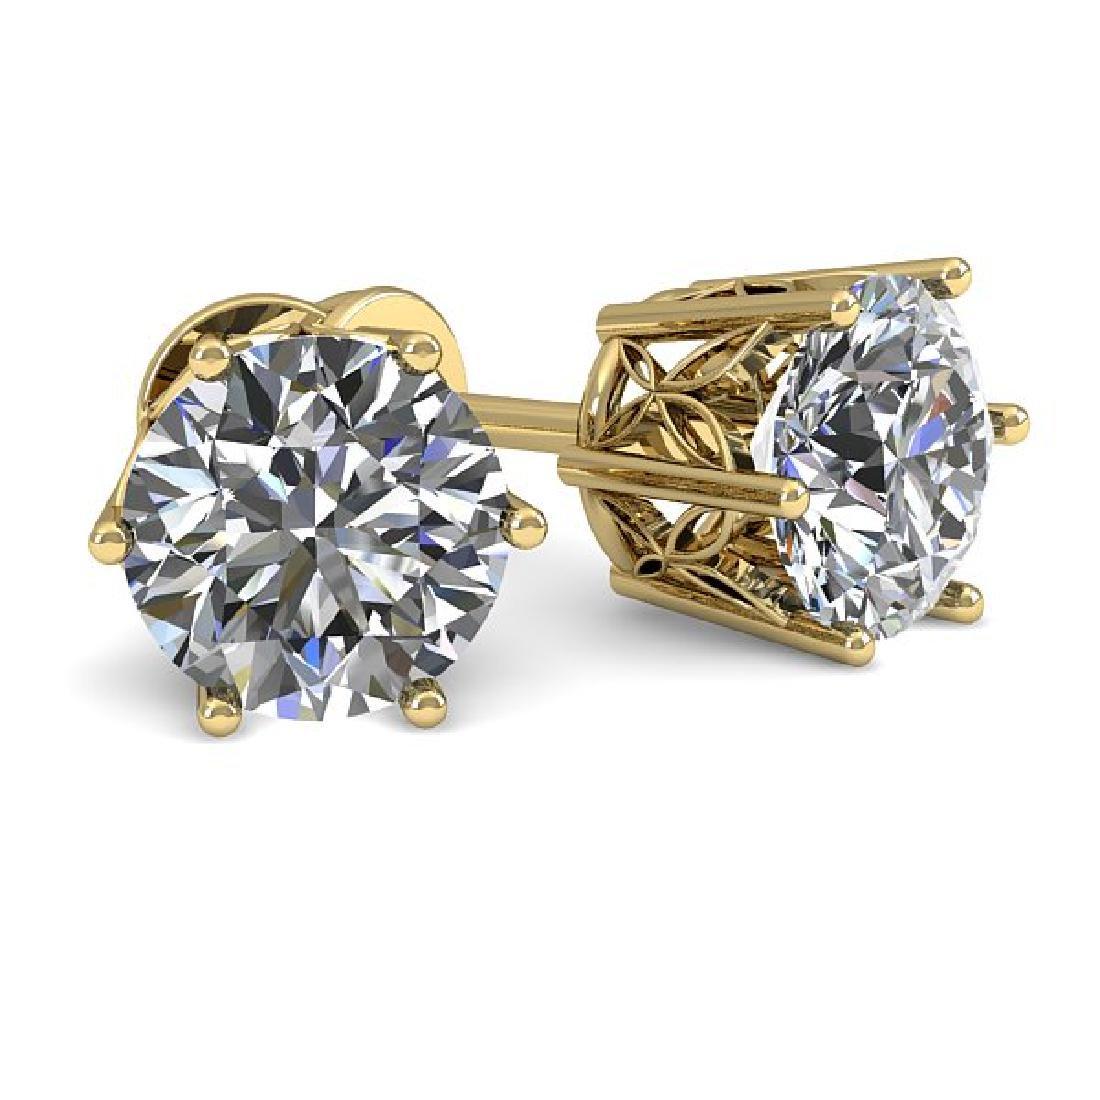 1.05 CTW VS/SI Diamond Stud Art Deco Earrings 14K